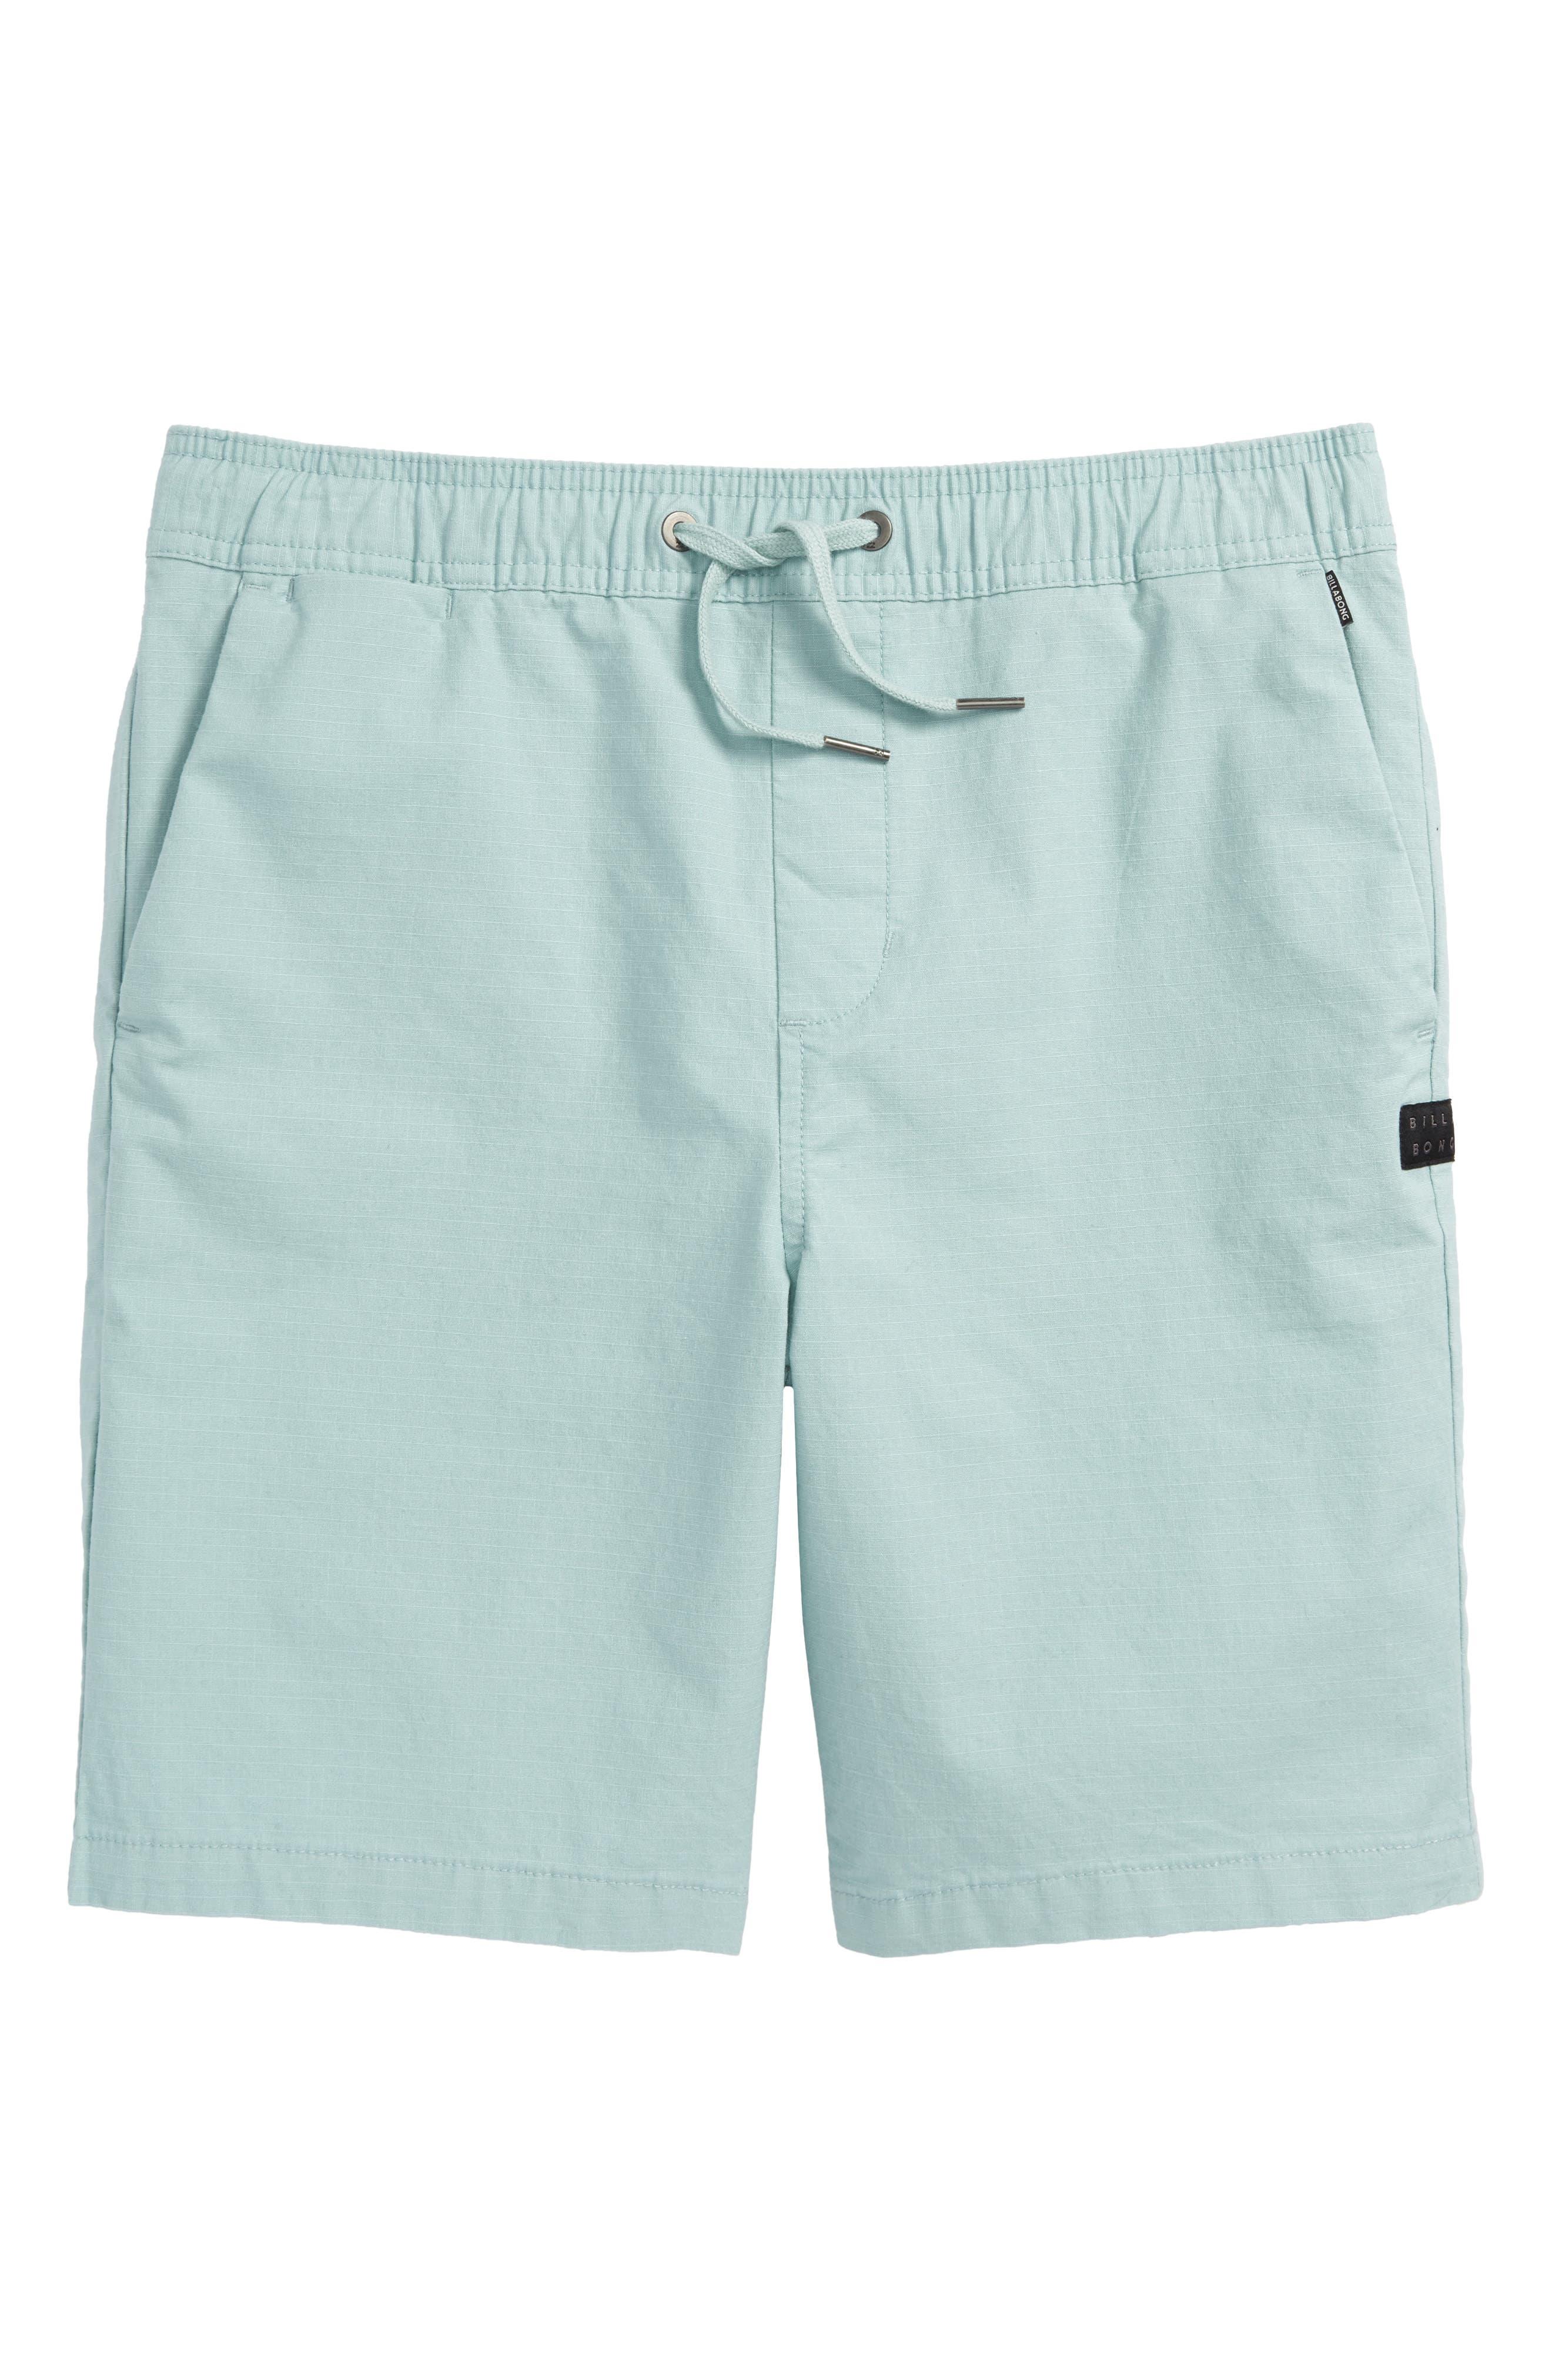 Larry Layback Shorts,                         Main,                         color, Dark Ozone